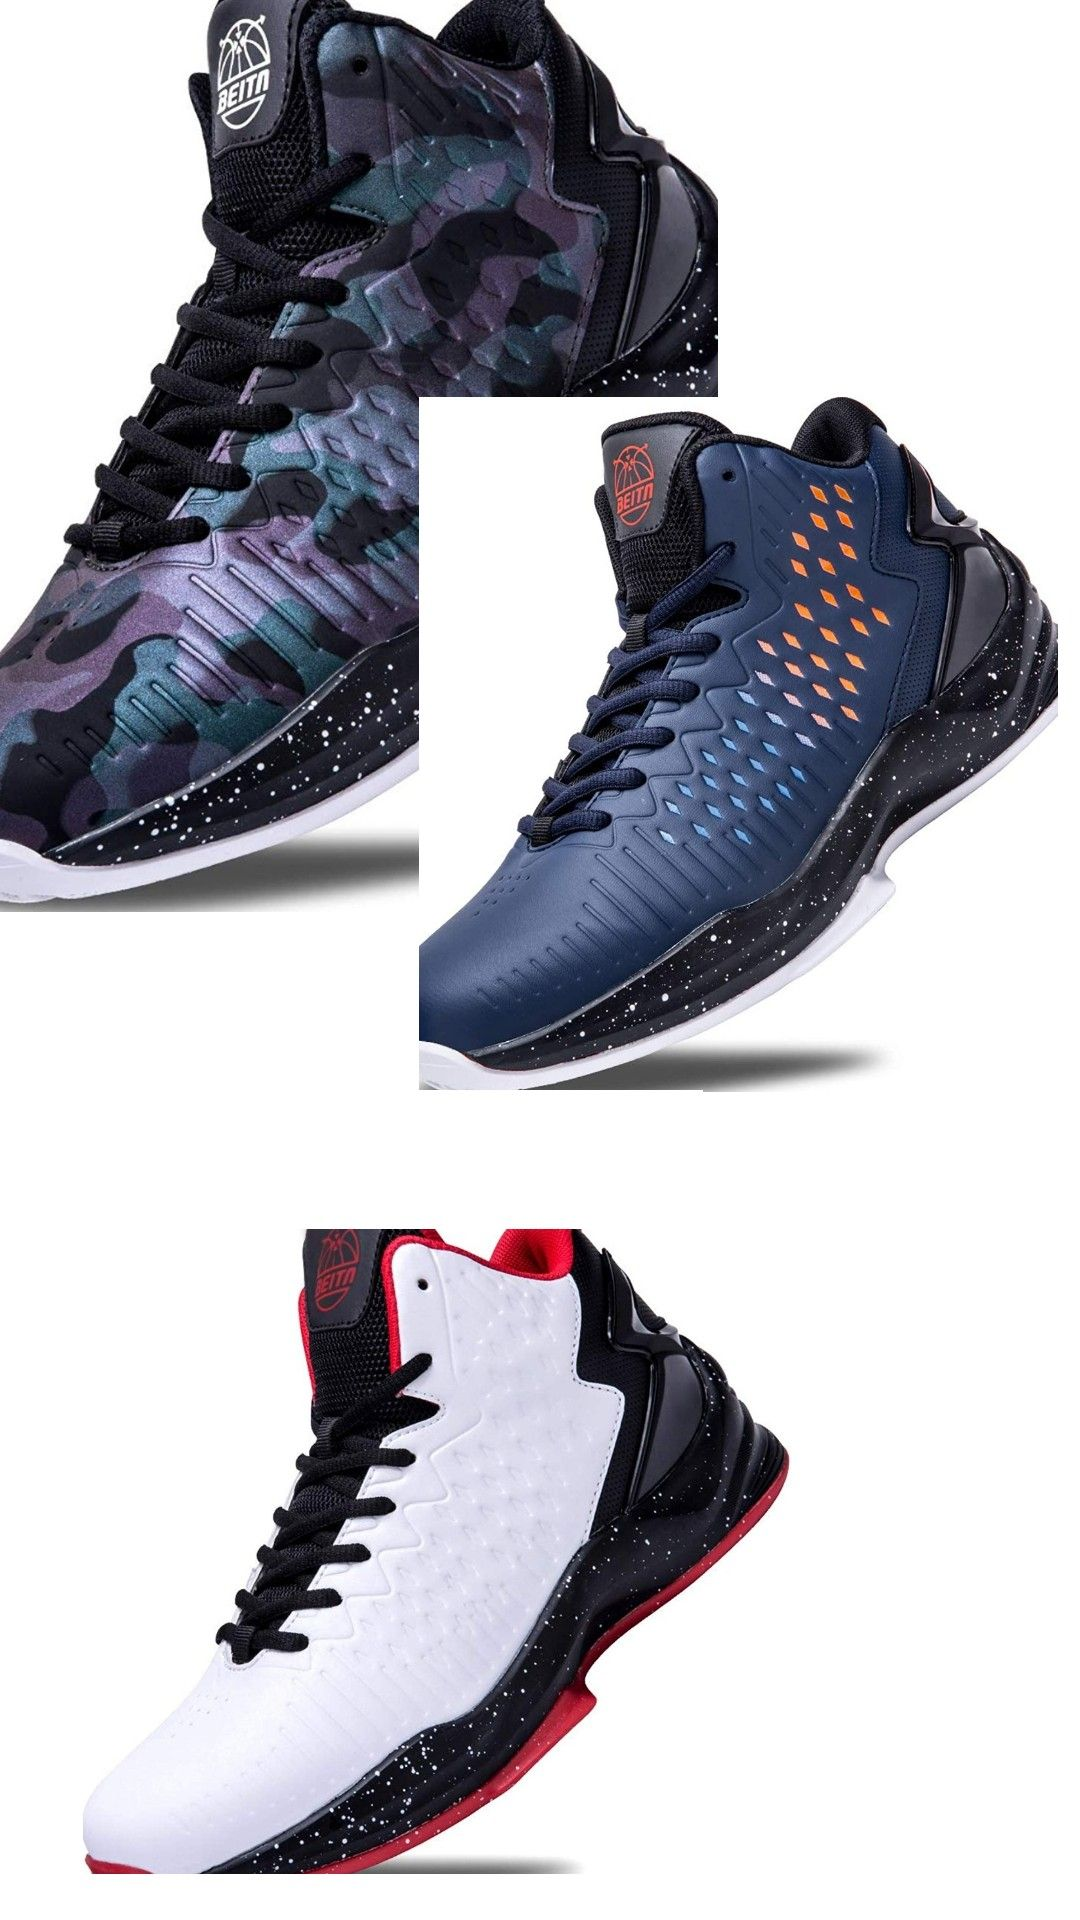 Sneakers, Sneakers men, Basketball shoes